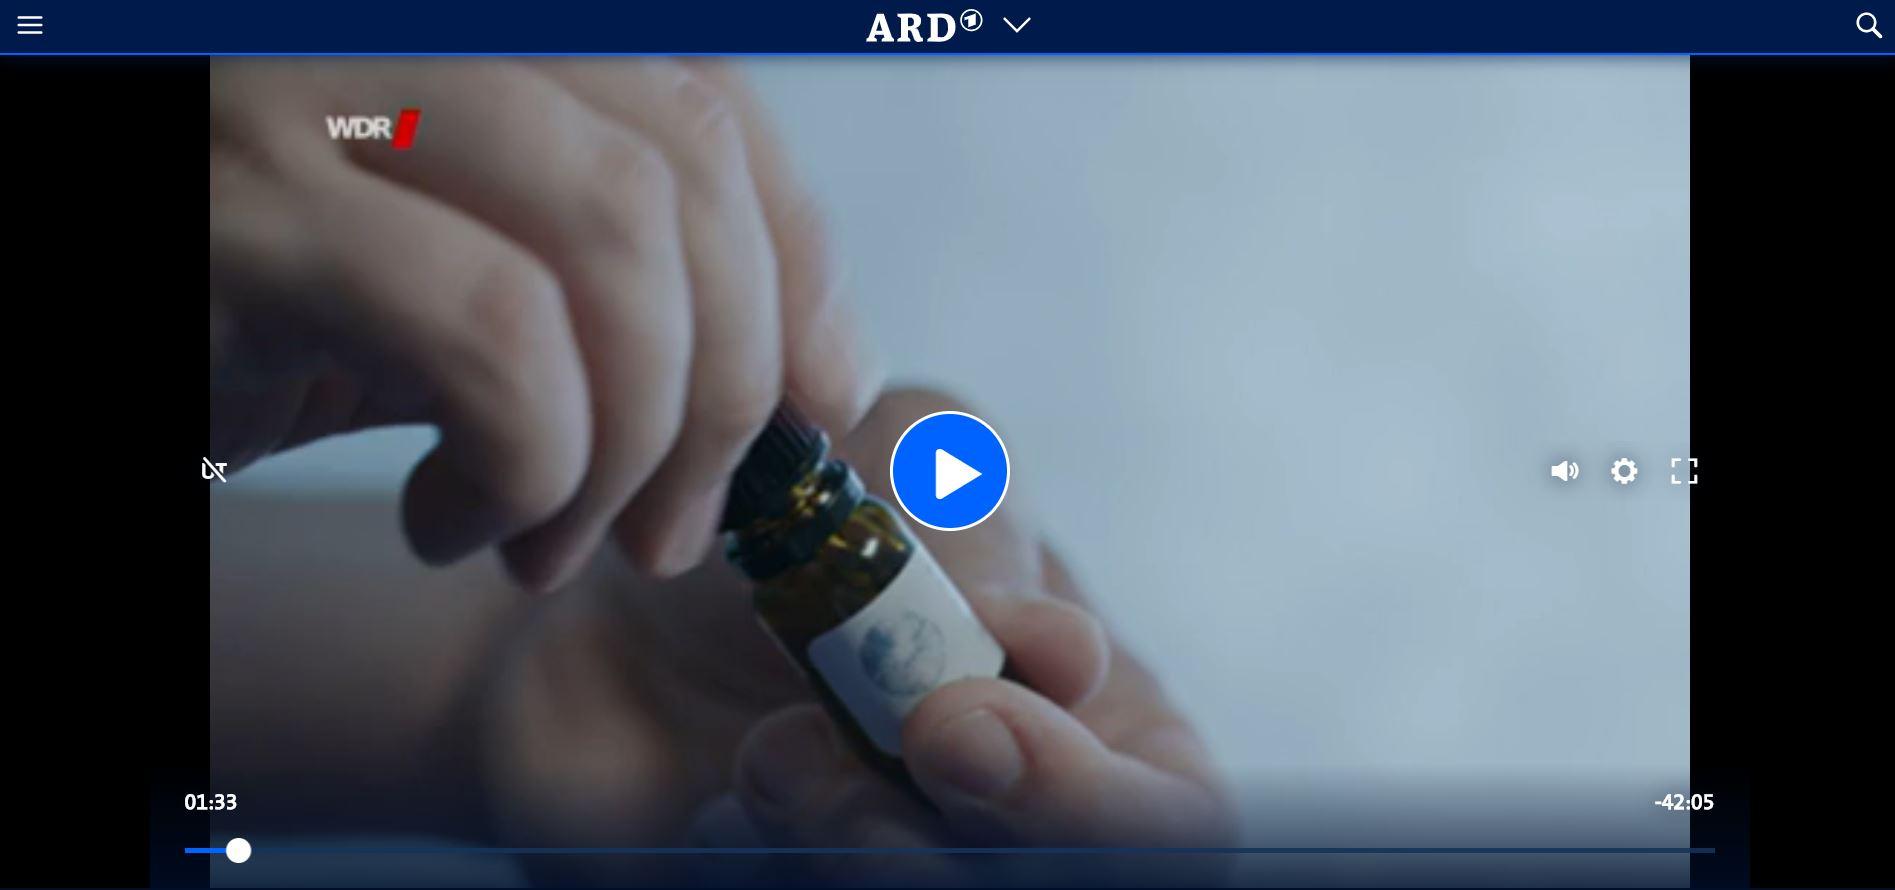 WDR-Doku: Das Comeback der Hippie-Droge LSD